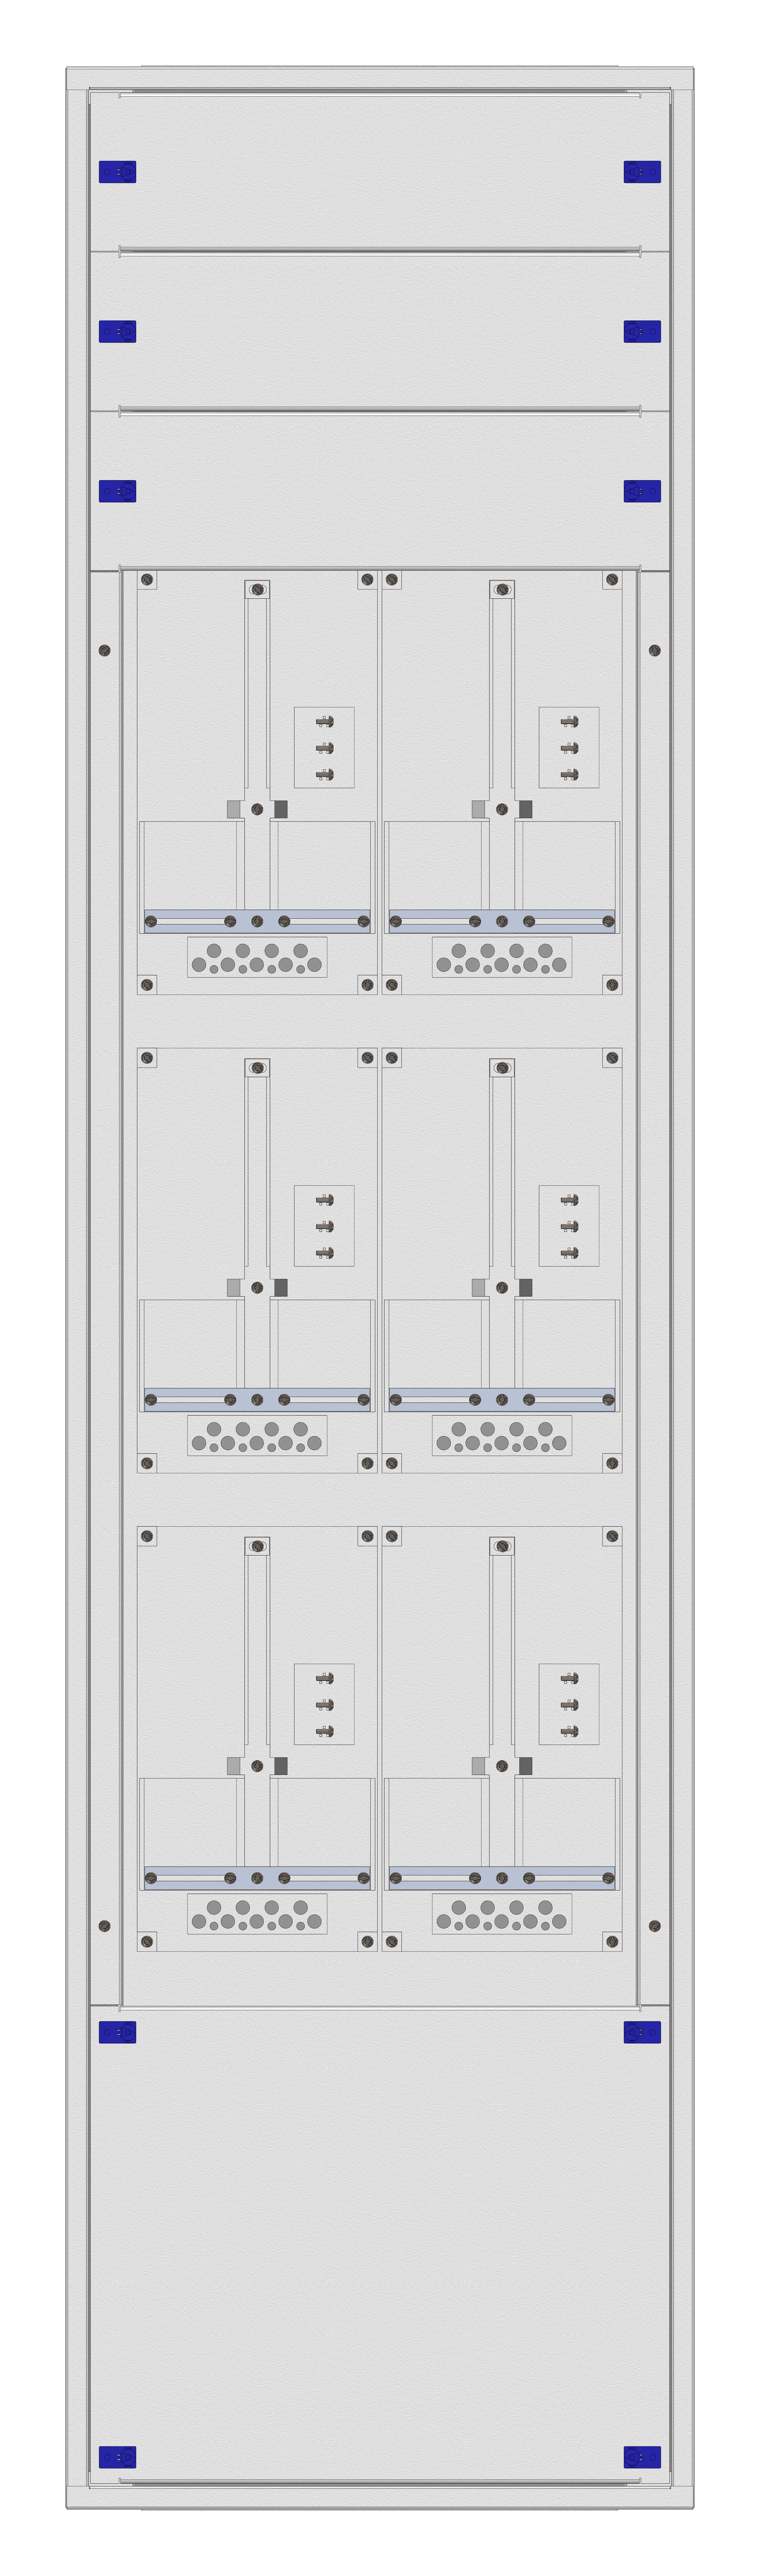 1 Stk Masken-Zählerverteiler 2M-45O/KTN 6ZP, H2130B540T200mm IL122245KK